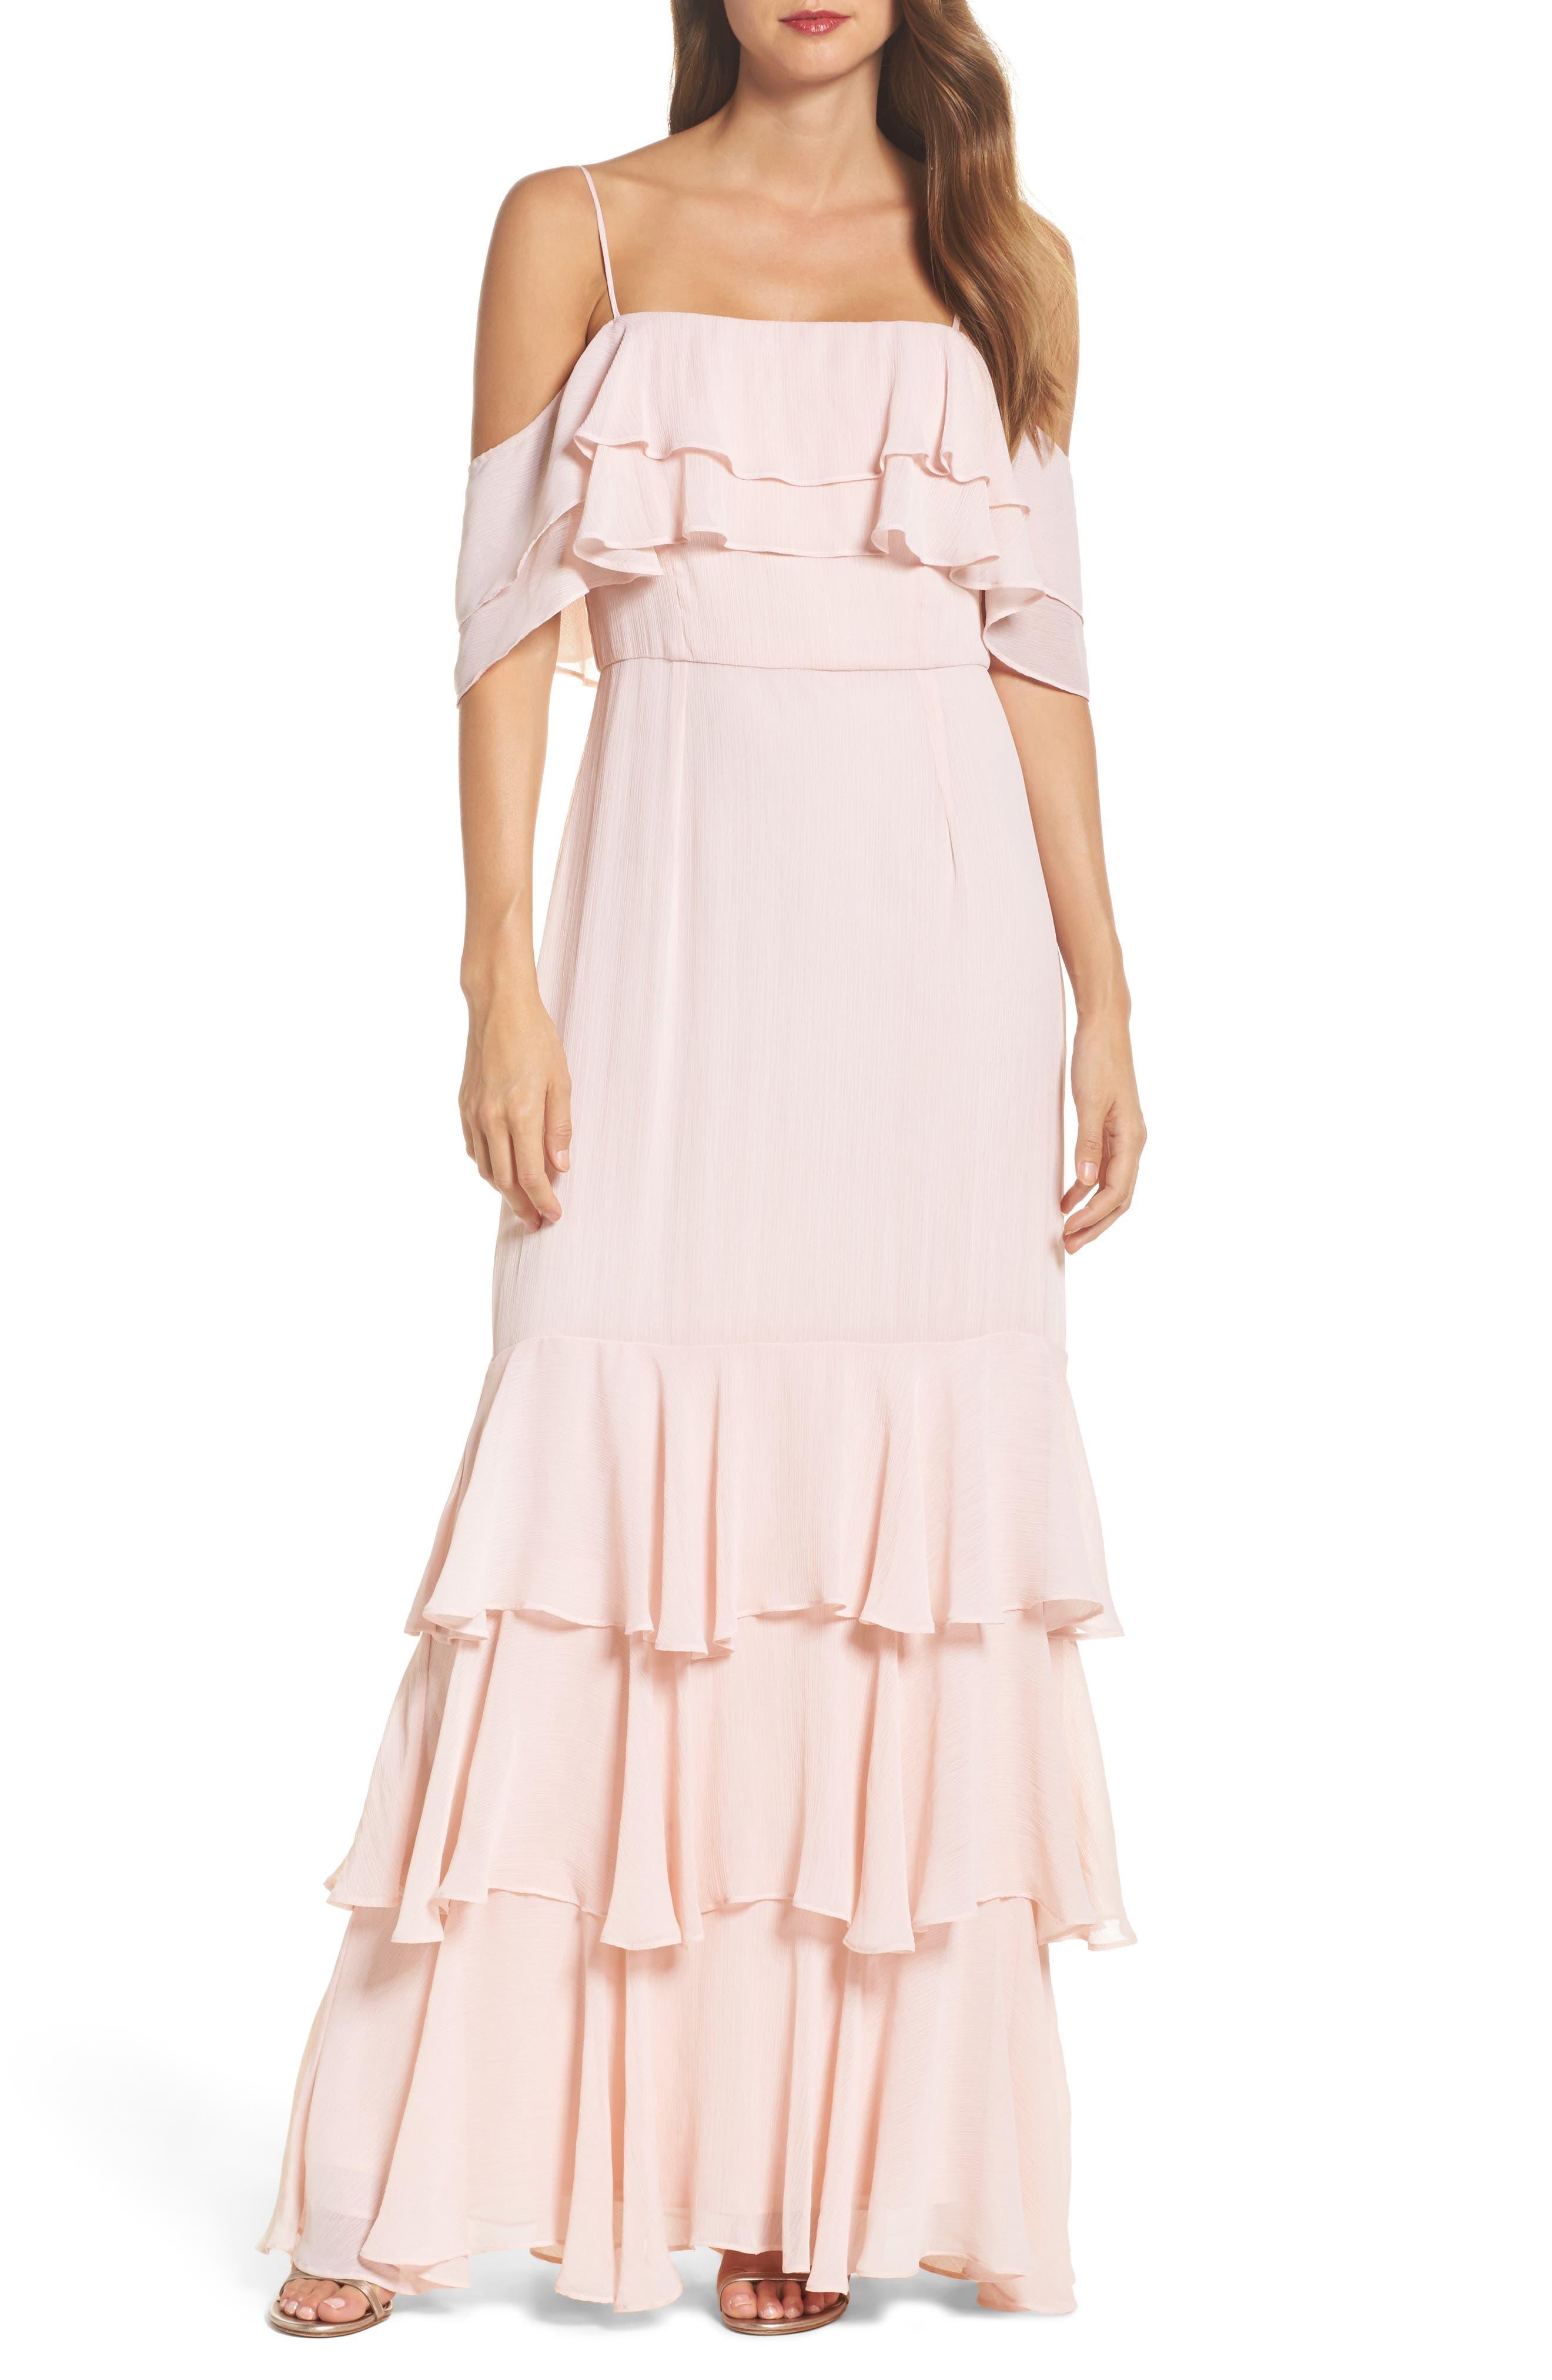 Lauren Cold Shoulder Tiered Gown,                             Main thumbnail 2, color,